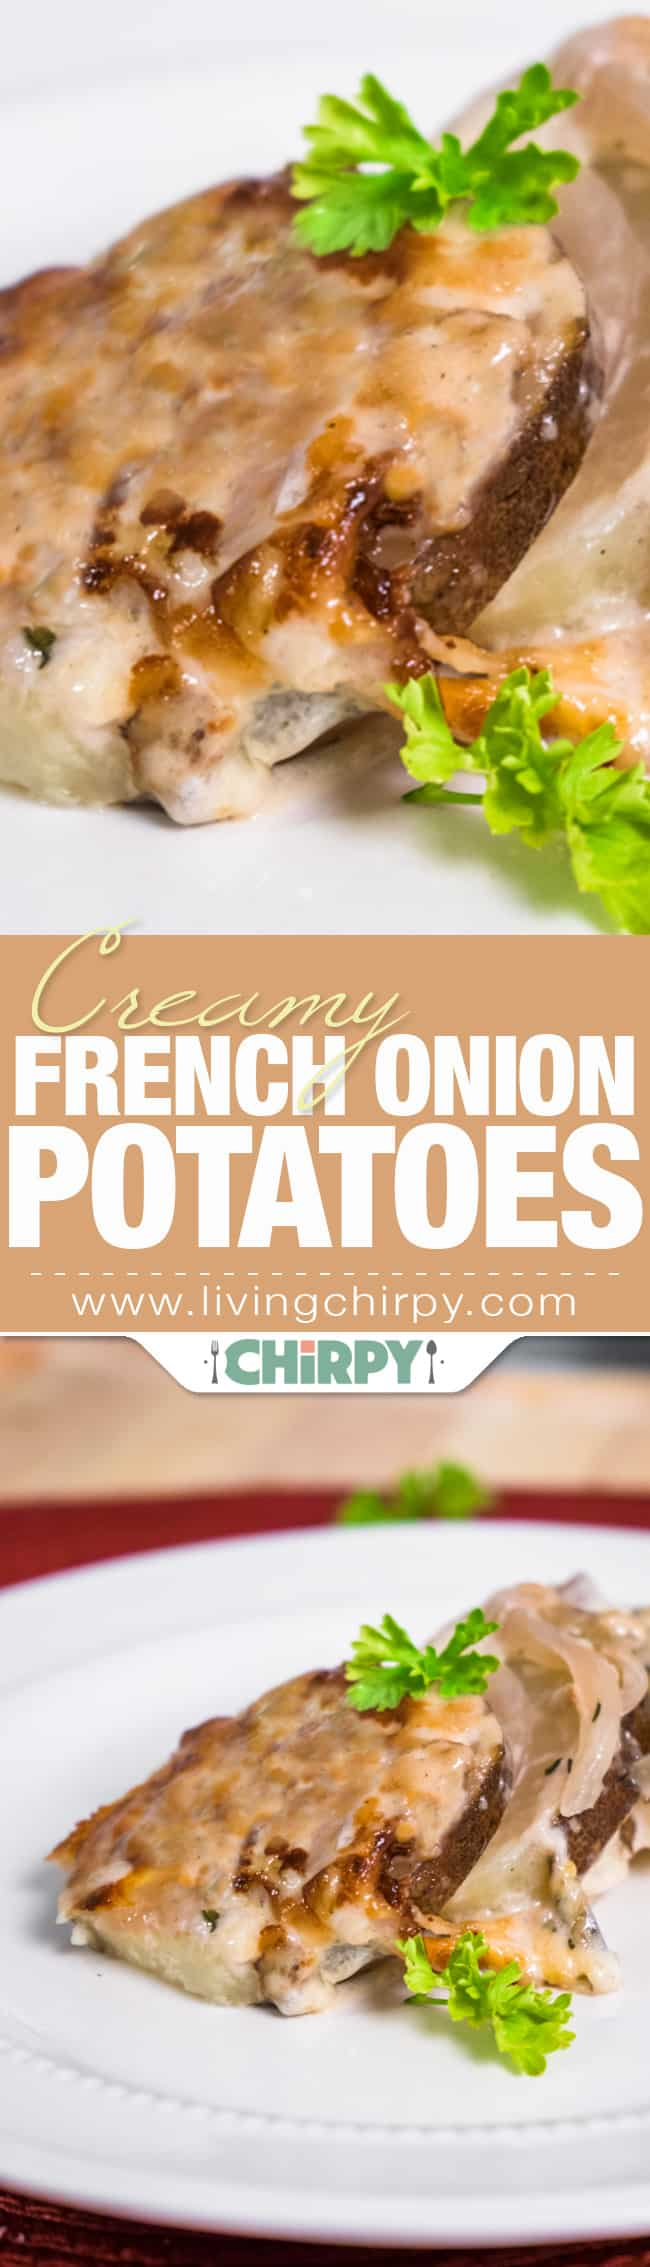 French Onion Potatoes